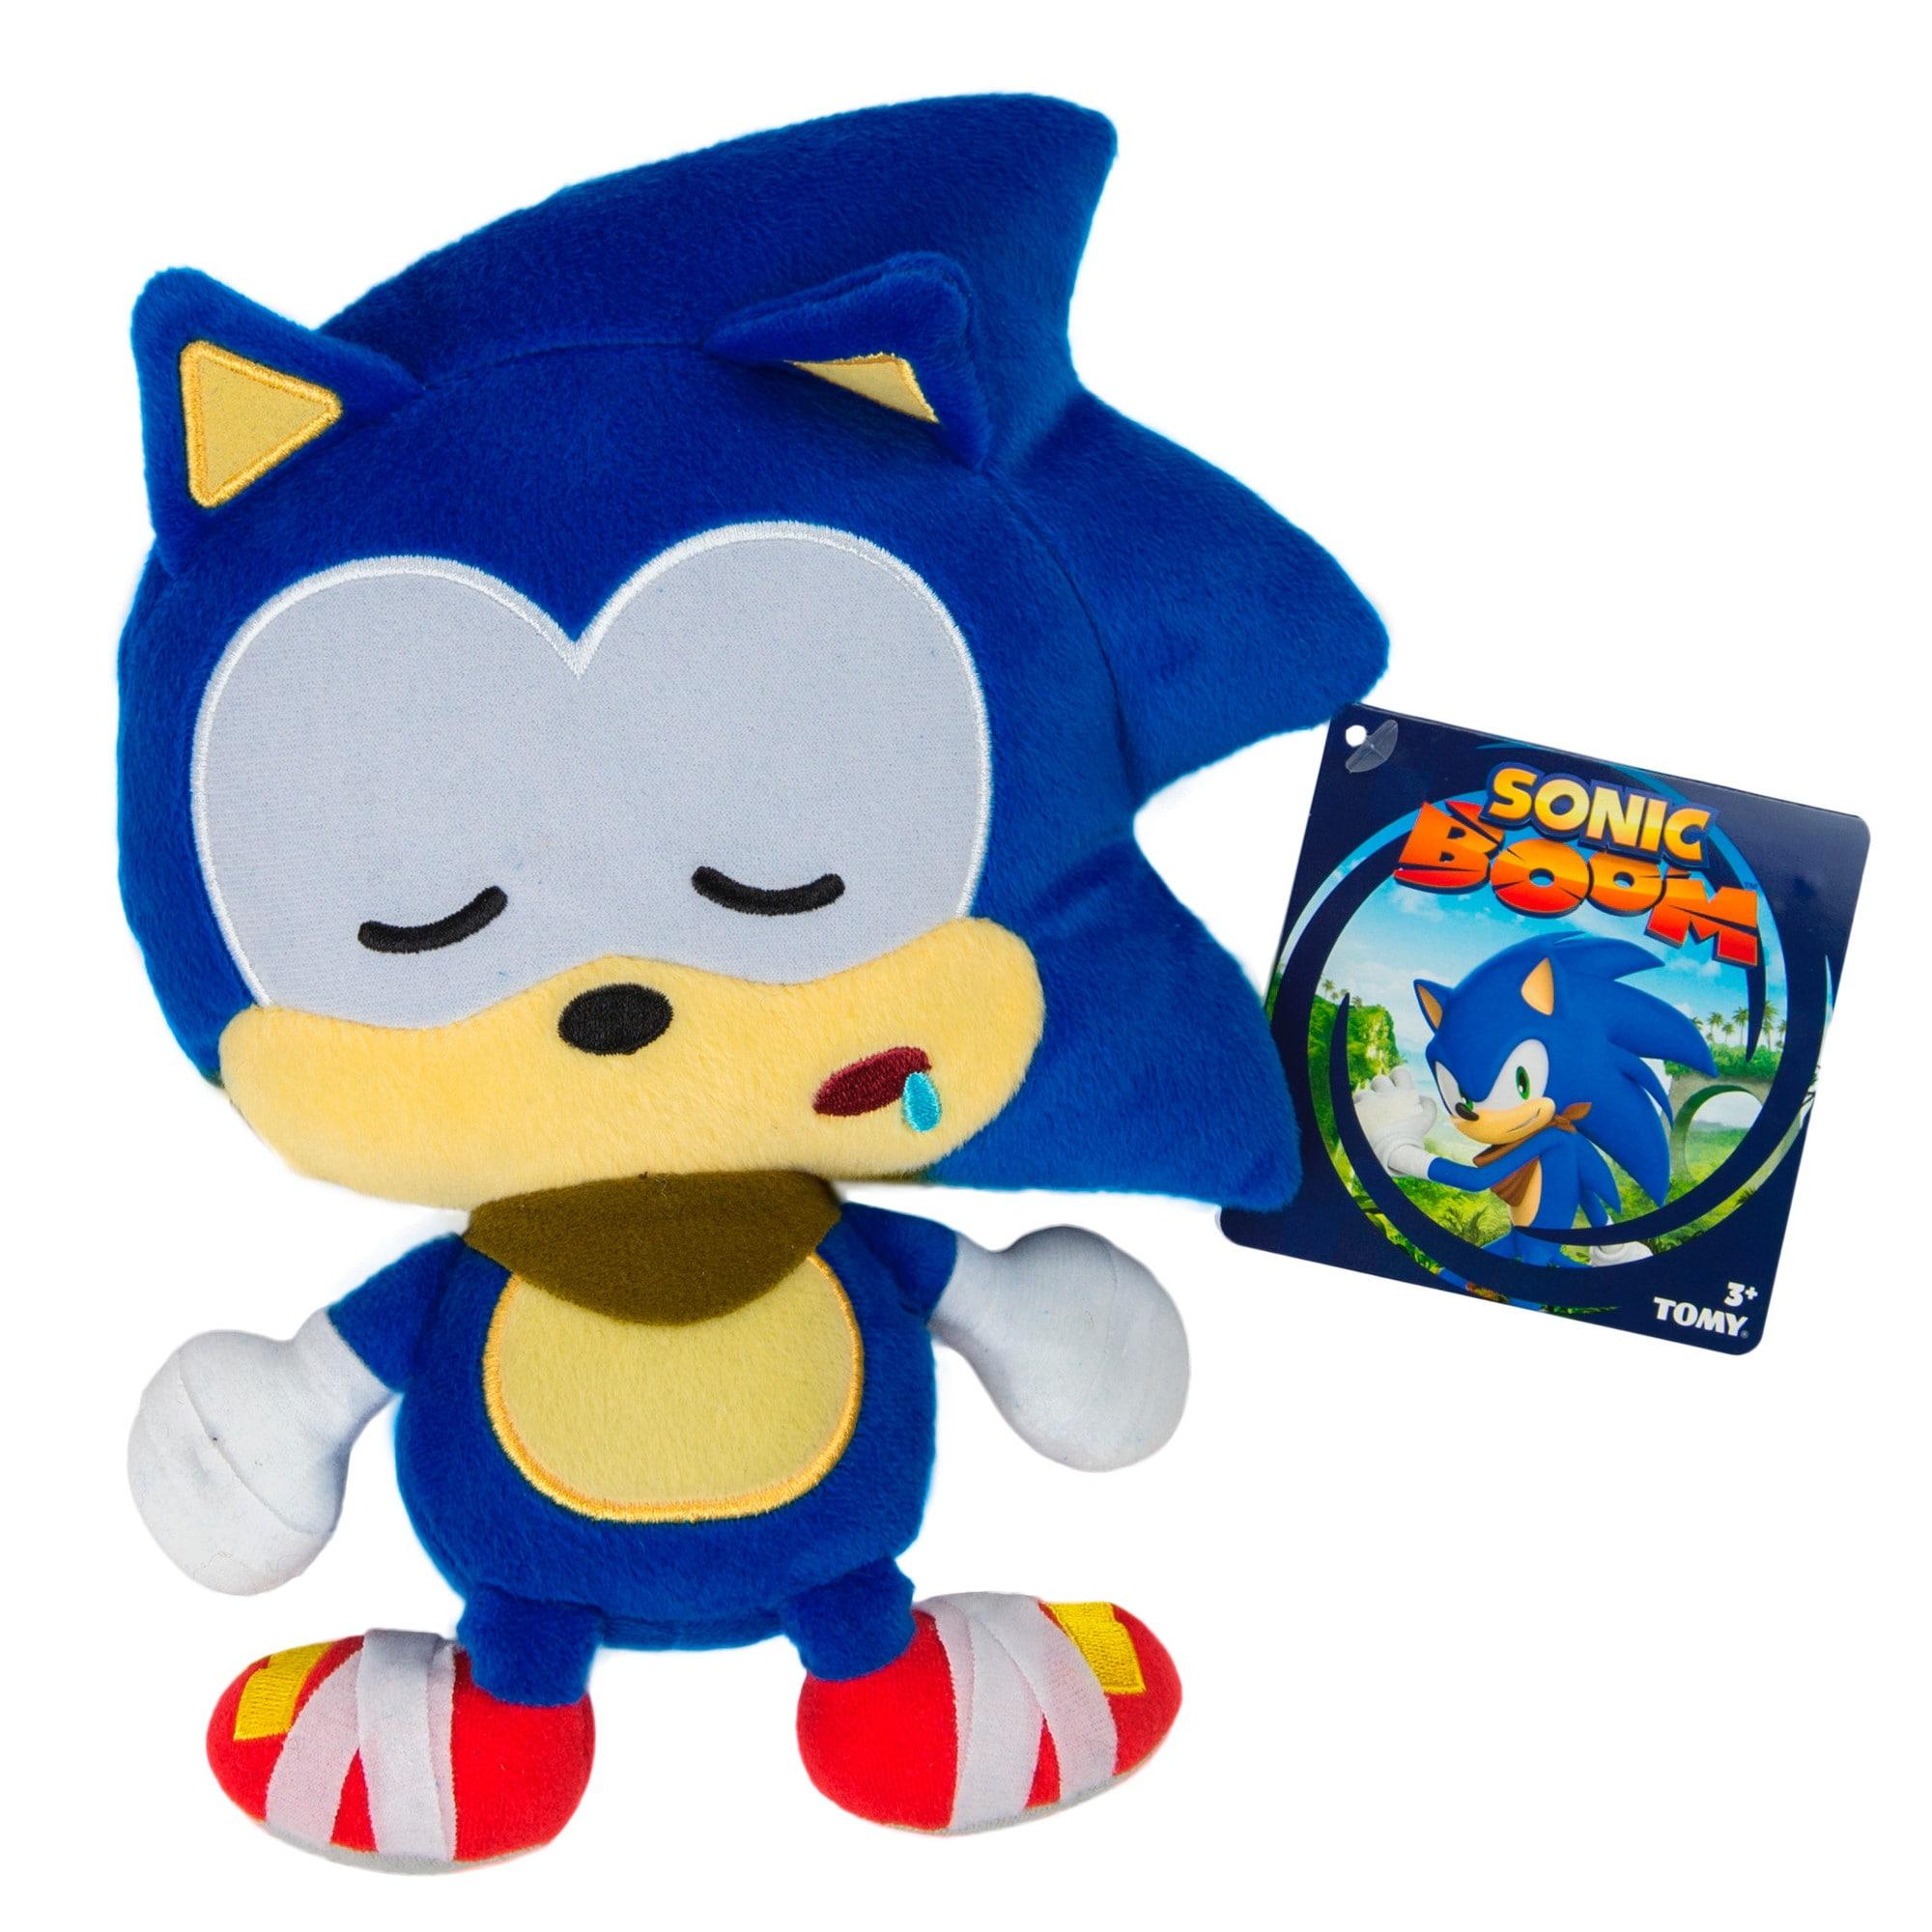 TOMY Sonic Boom Emoji Plush Sleepy Sonic (1)